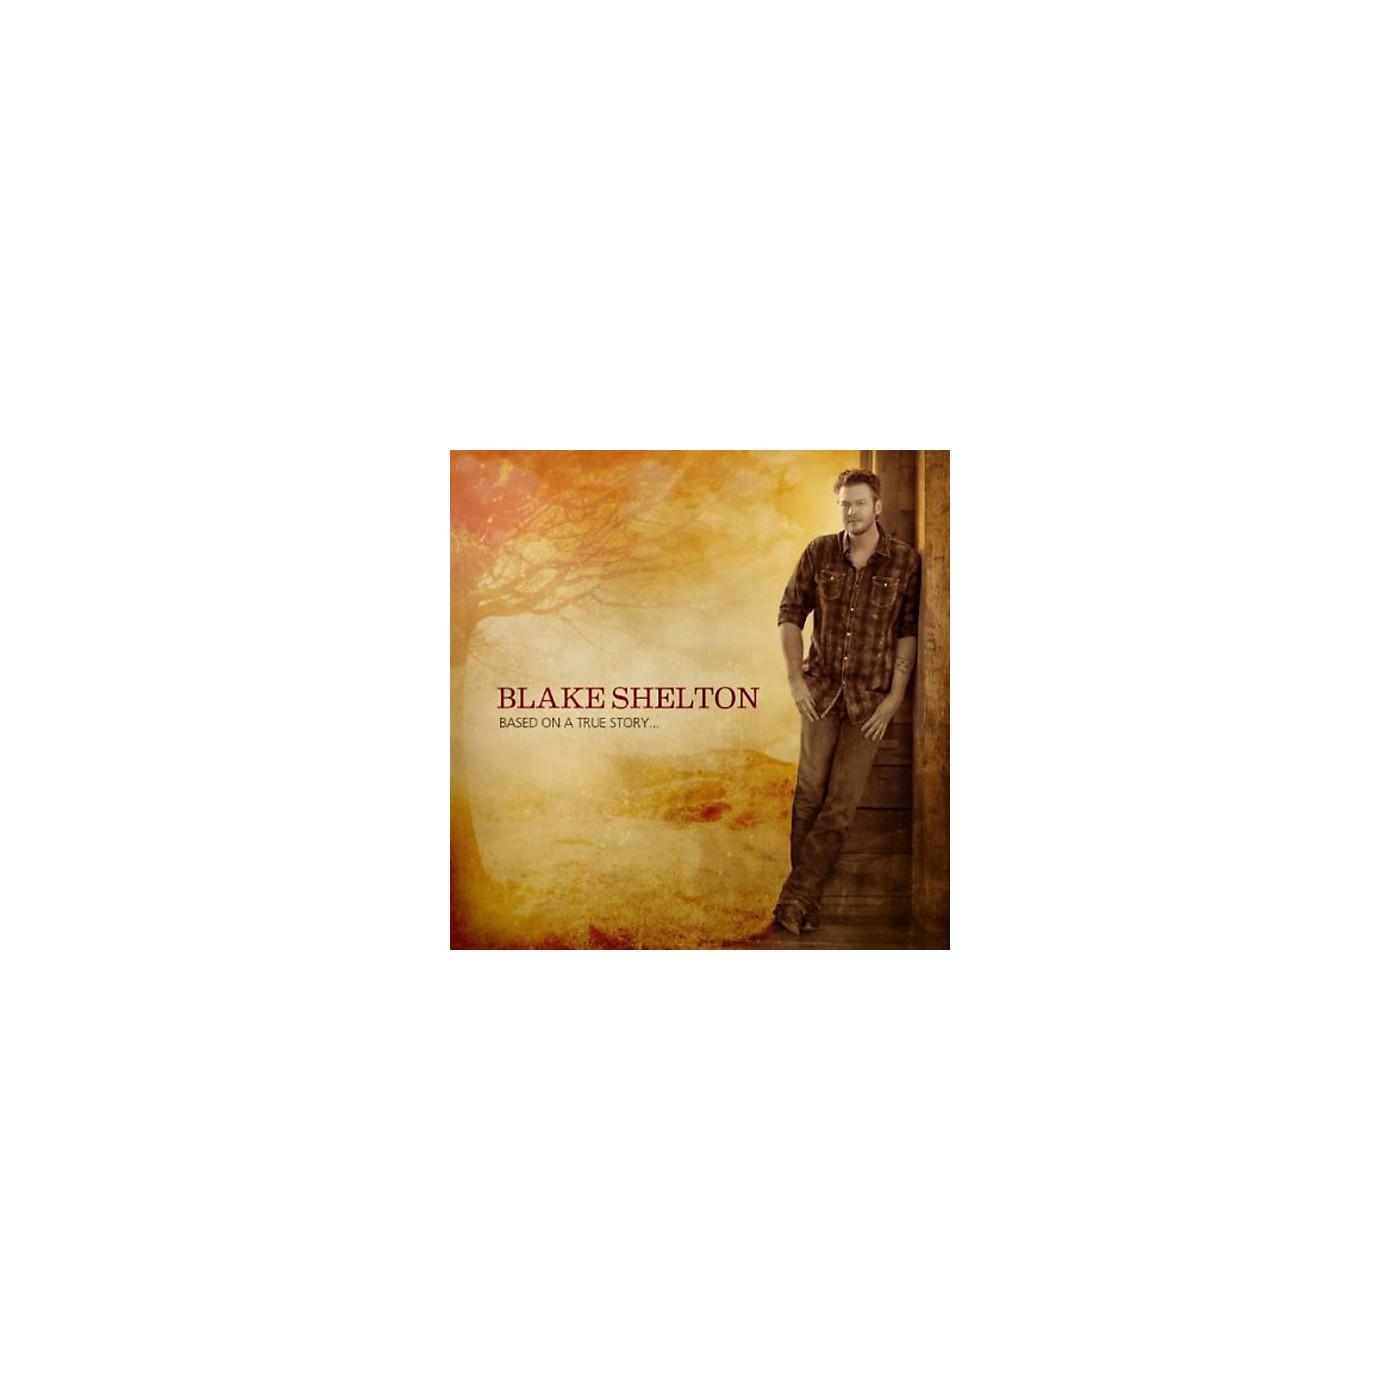 Alliance Blake Shelton - Based on a True Story (CD) thumbnail